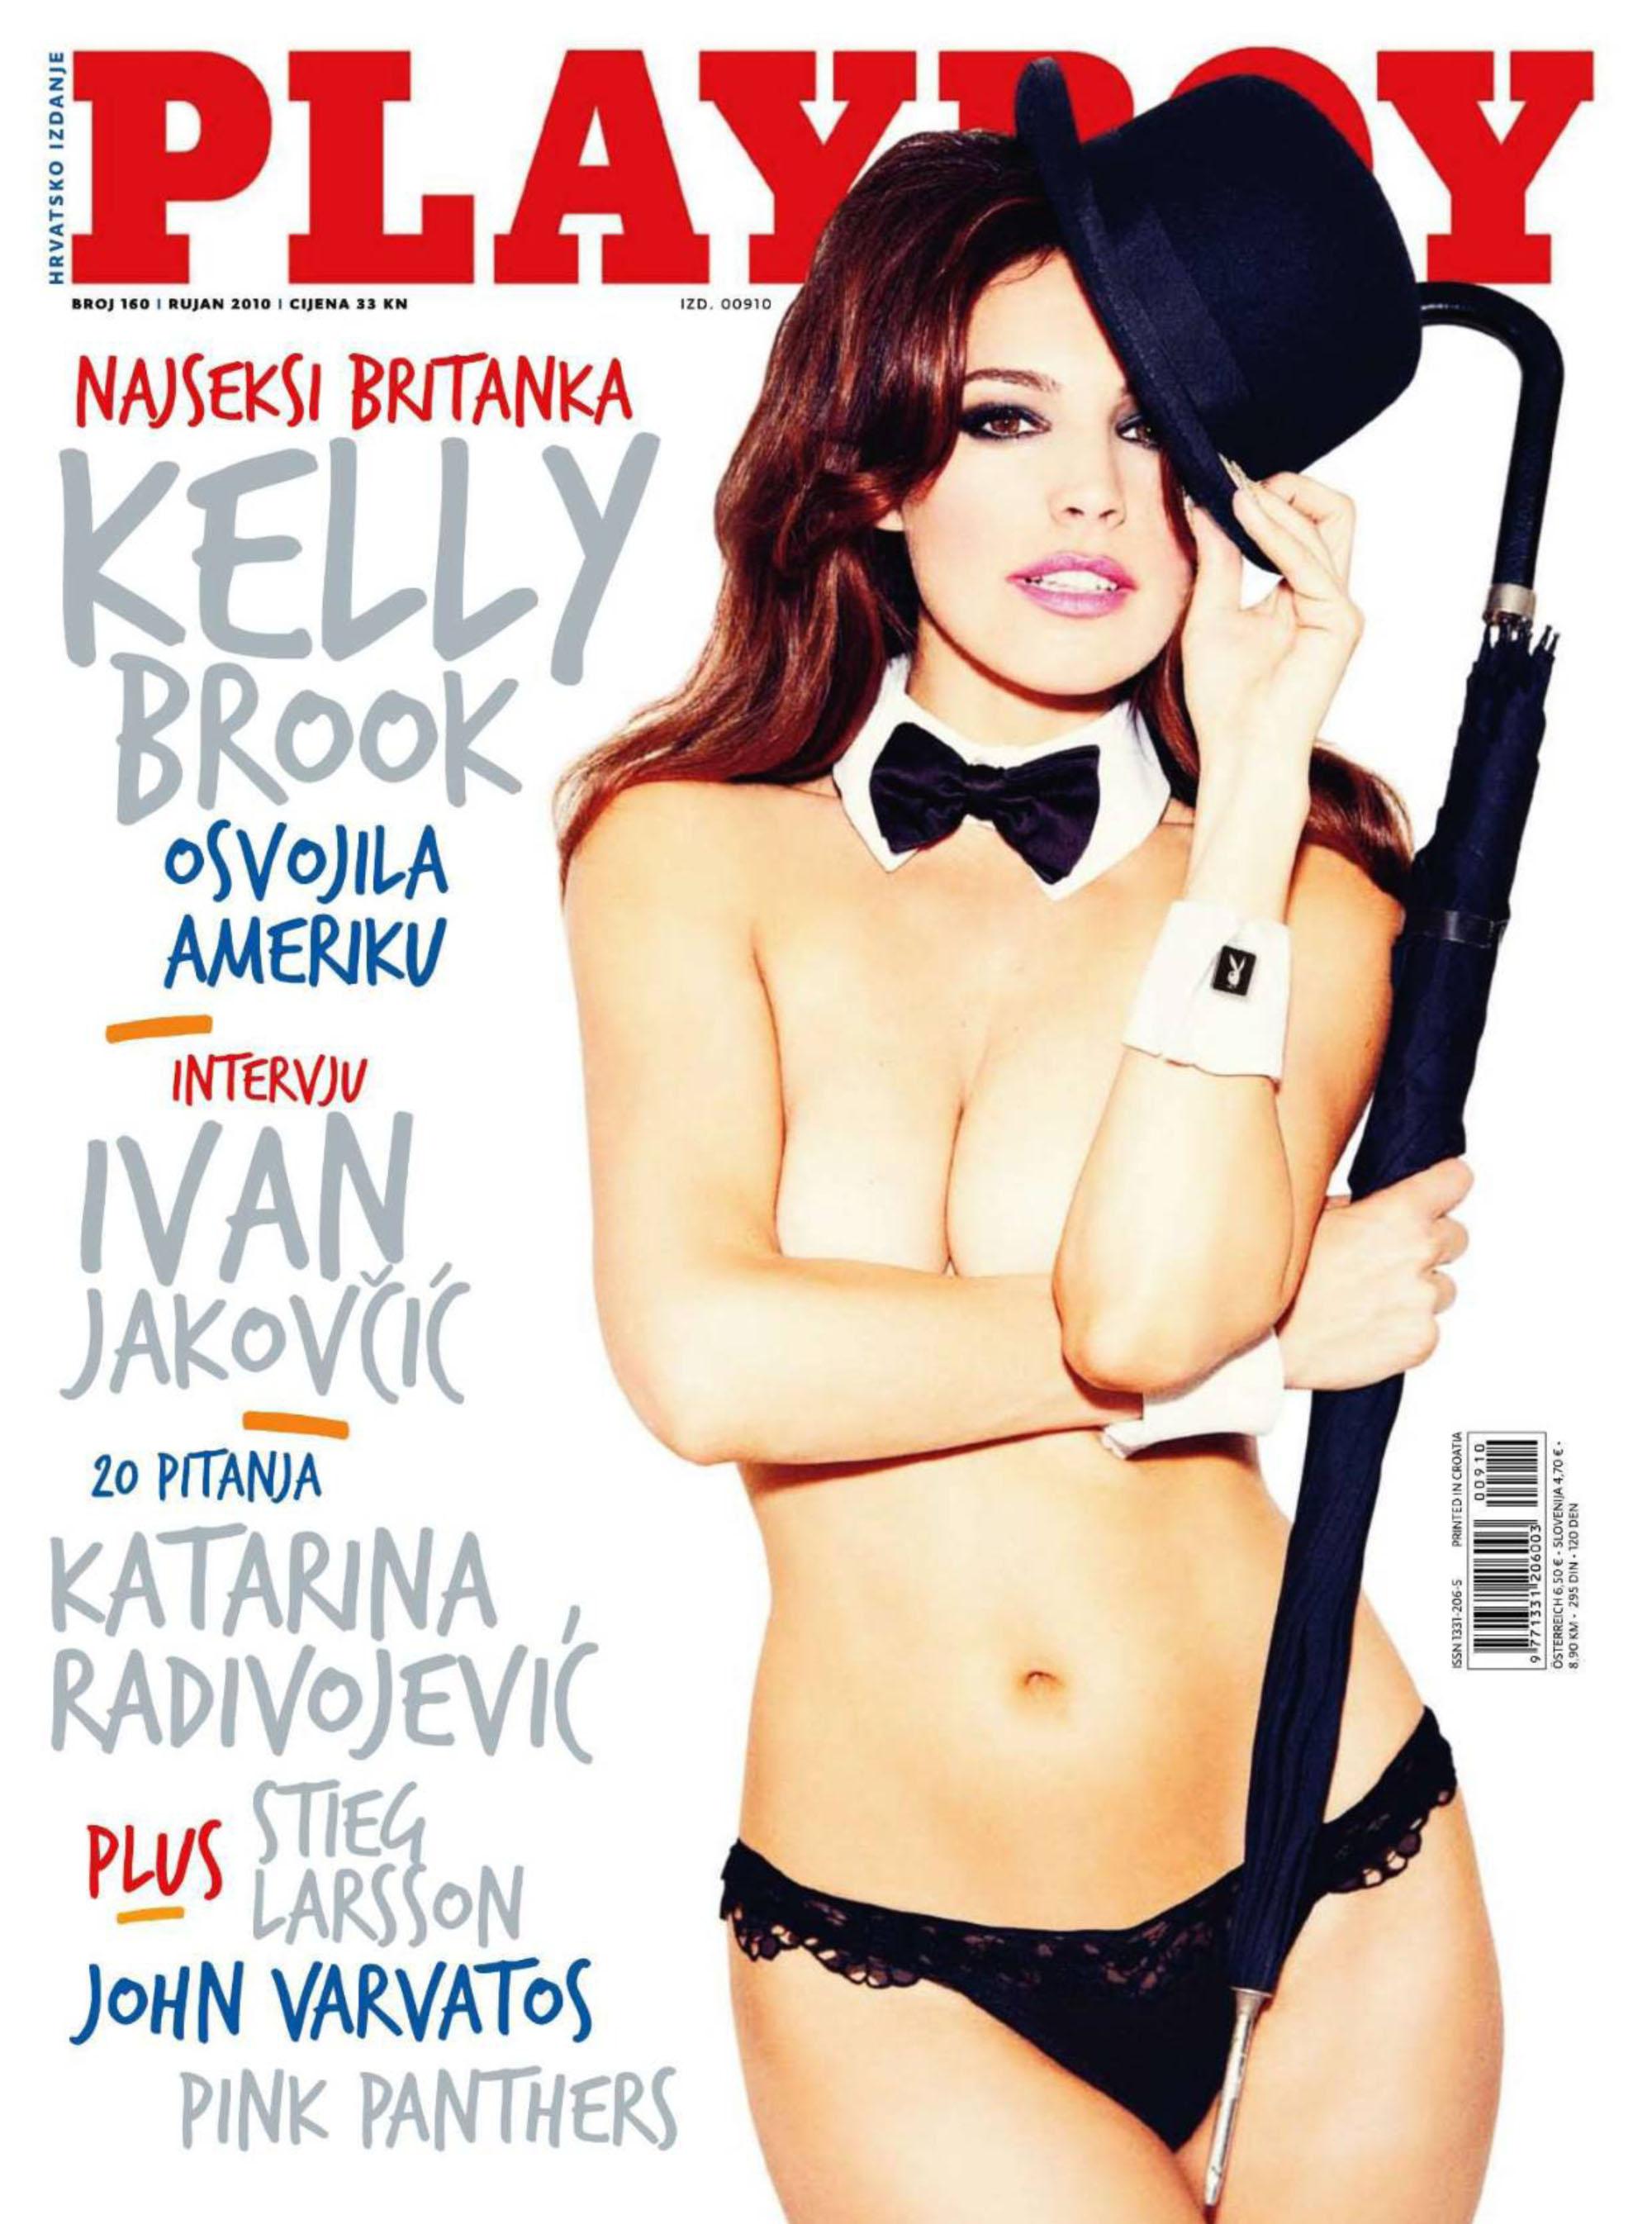 95228_Playboy2010_09Croatia_1_123_198lo.jpg